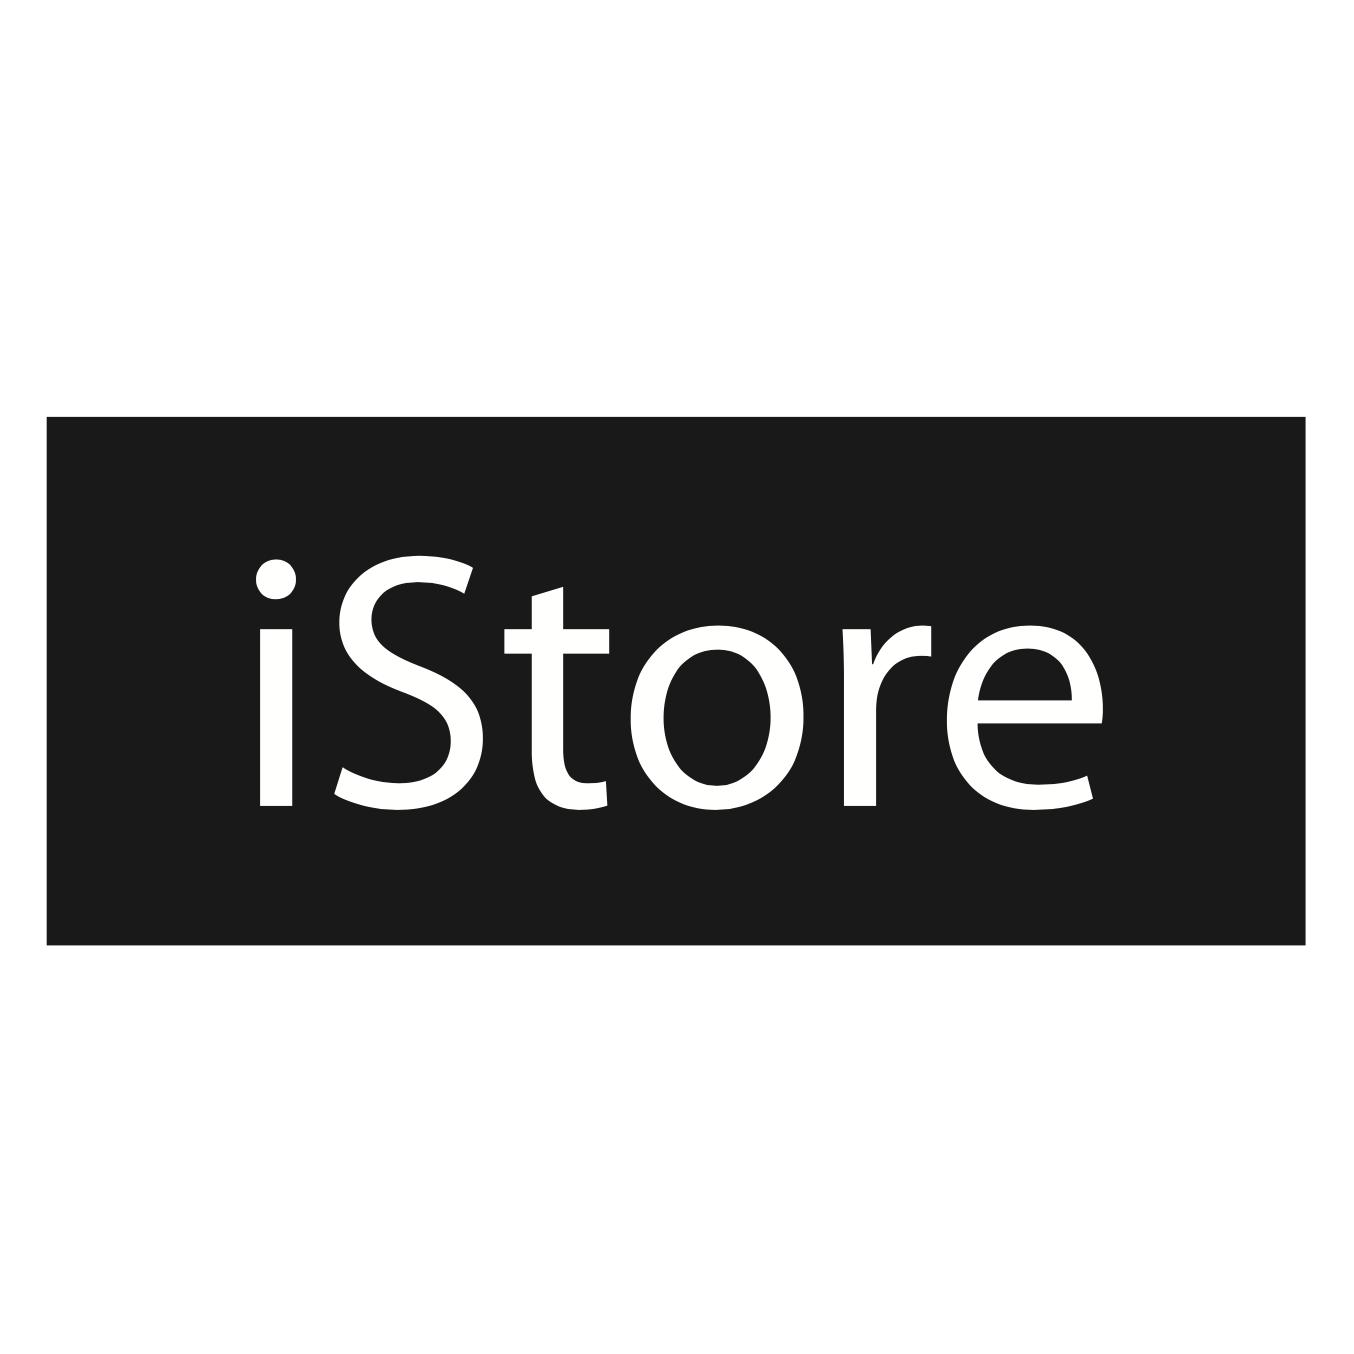 iPhone 8 / 7 Silicone Case - Peach